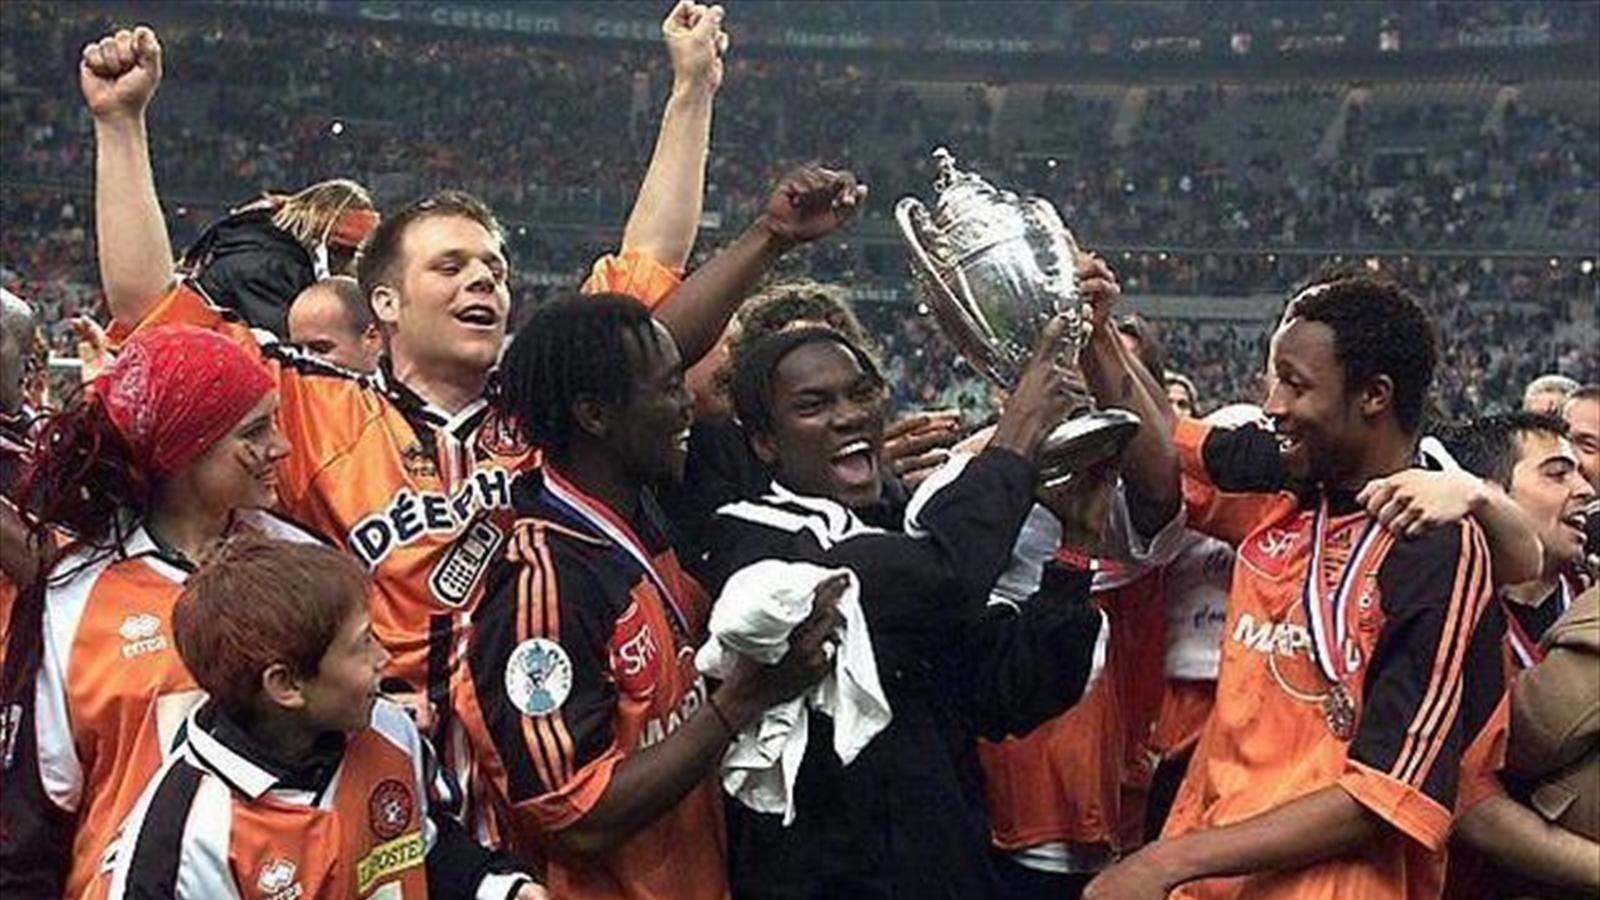 Video le jour o r mi gaillard a gagn la coupe de - Resultats coupe de france football 2015 ...